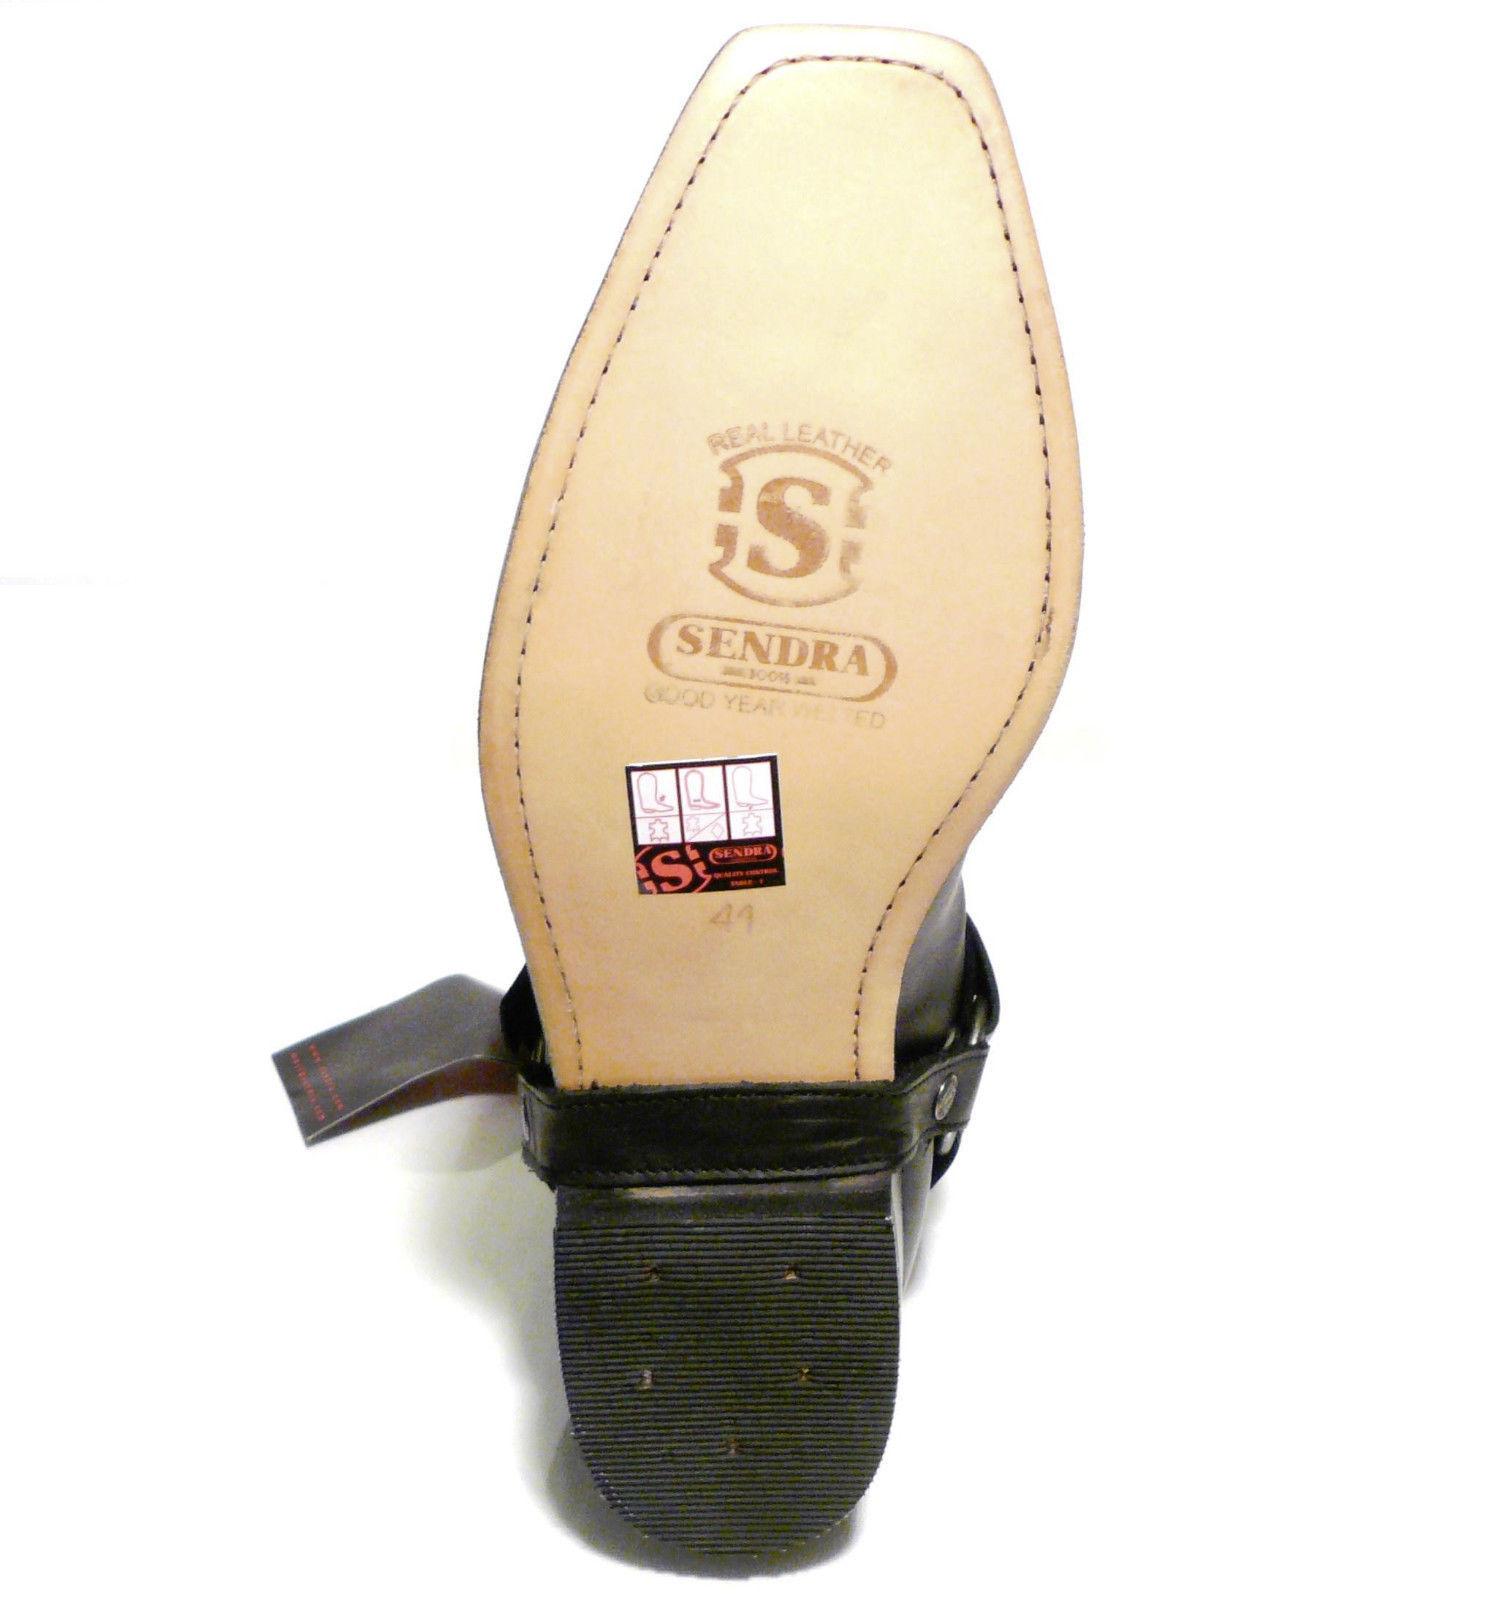 Sendra Stiefel 6445 Cowboystiefel Westernstiefel Motorradstiefel Biker 6445 Stiefel Schwarz c553ad